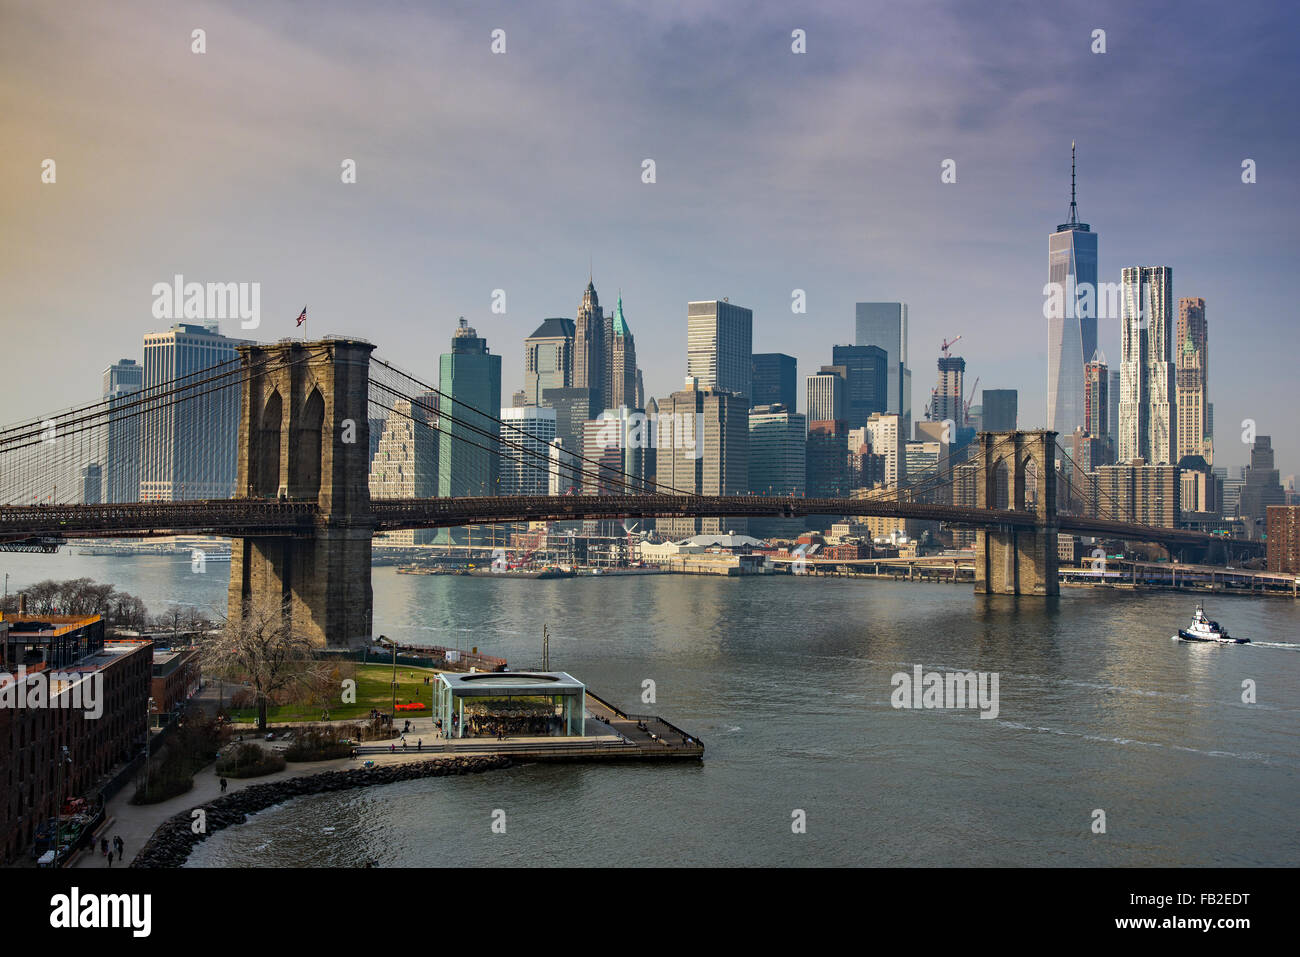 Brooklyn Bridge and Lower Manhattan skyline, New York, USA Stock Photo